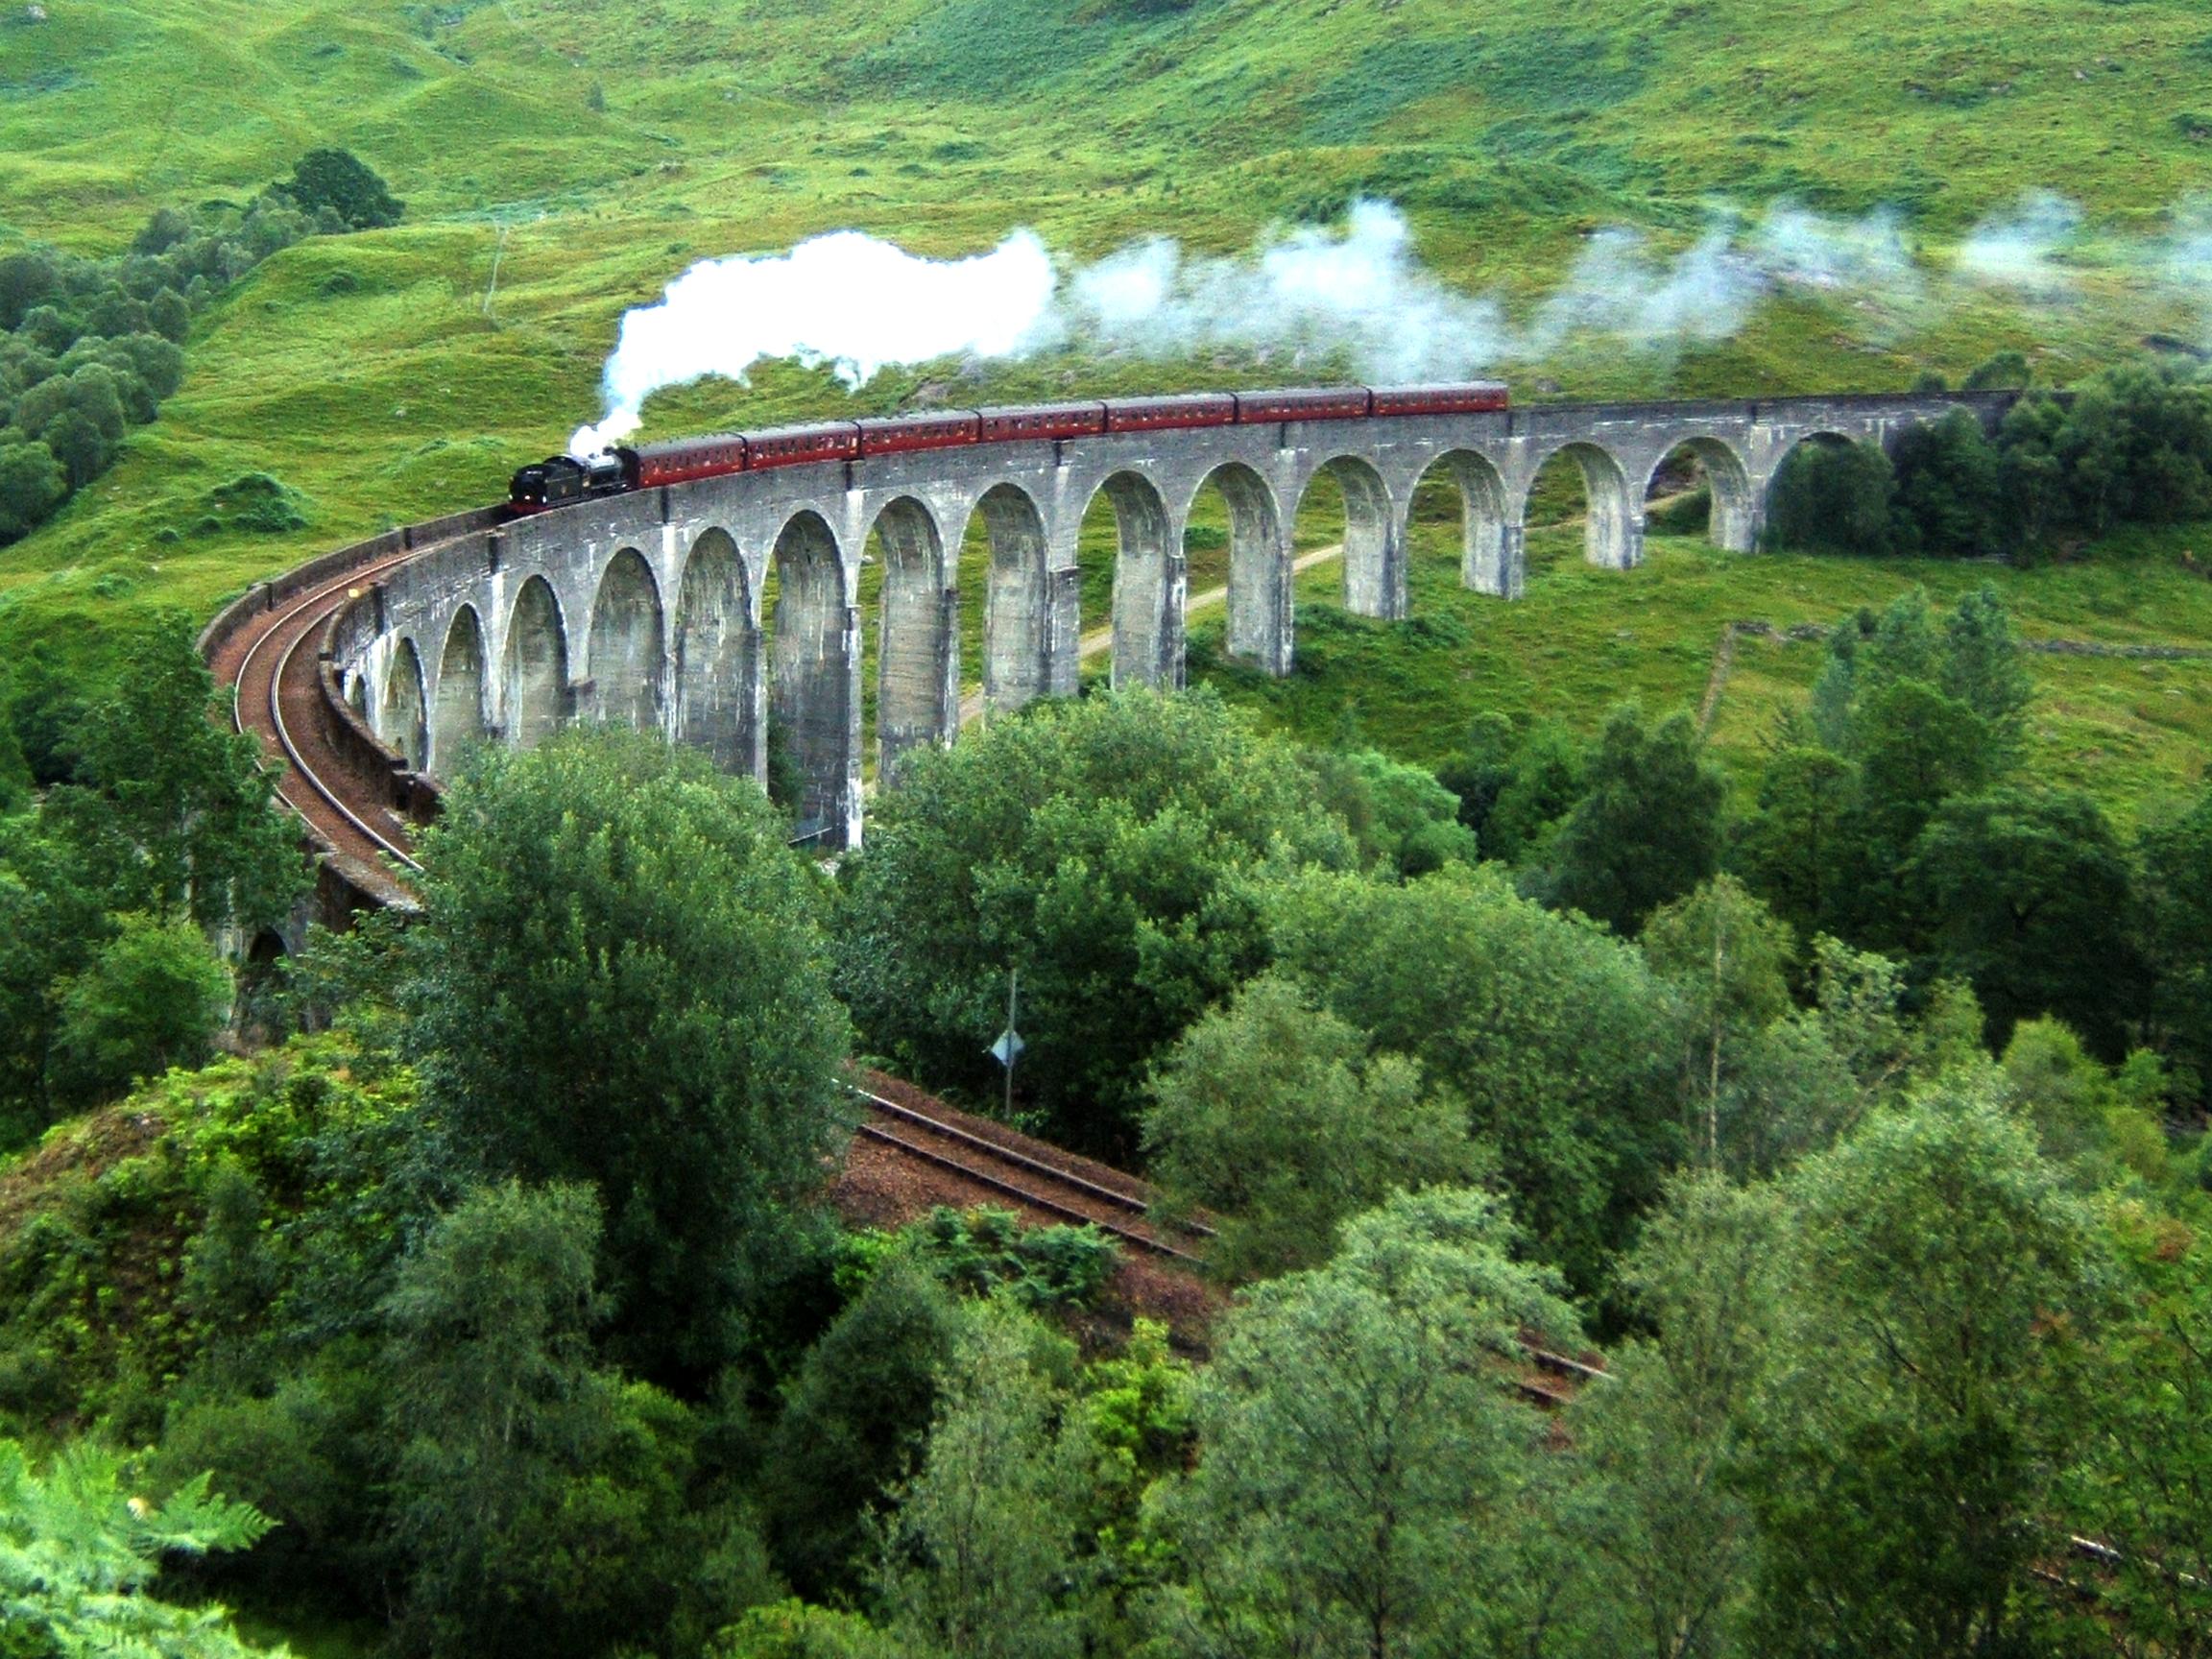 Harry Potter Filming Location: Glenfinnan Viaduct